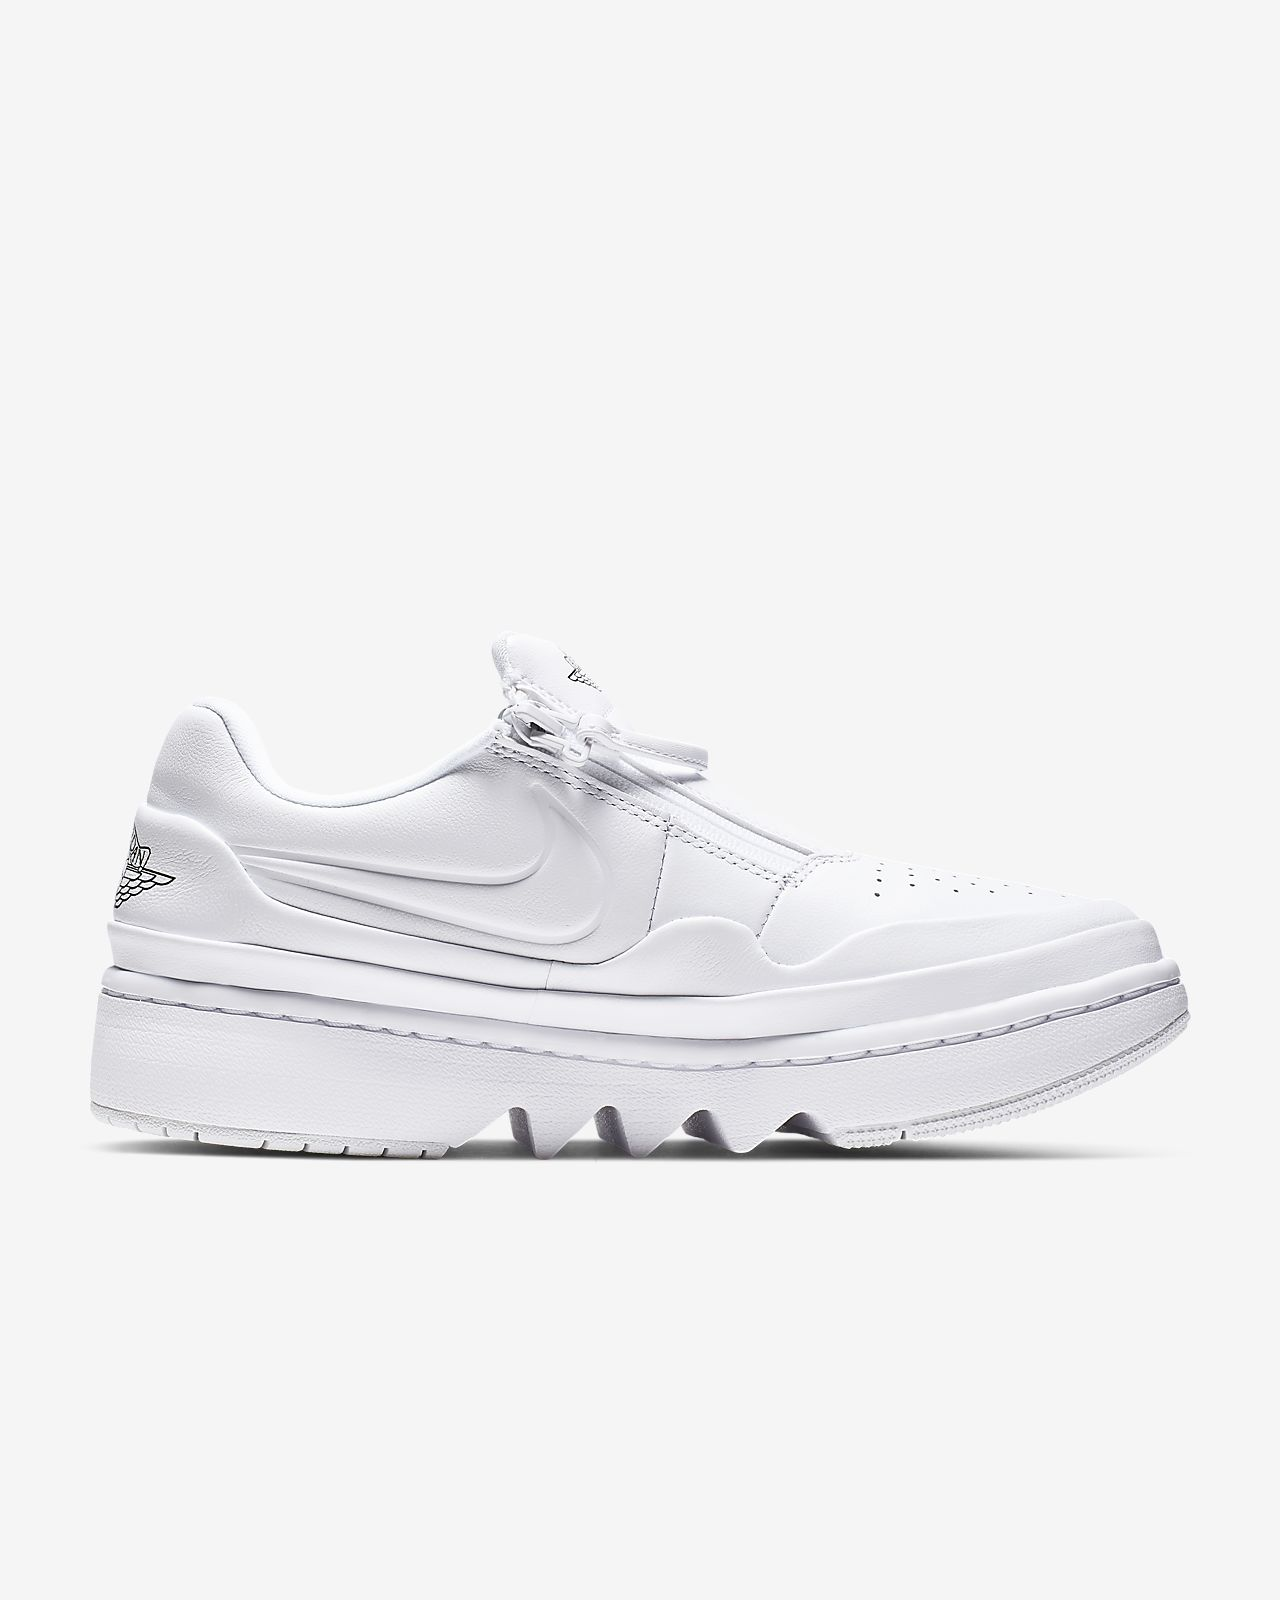 reputable site dd0eb 1b34d Air Jordan 1 Jester XX Low sko til dame. Nike.com NO